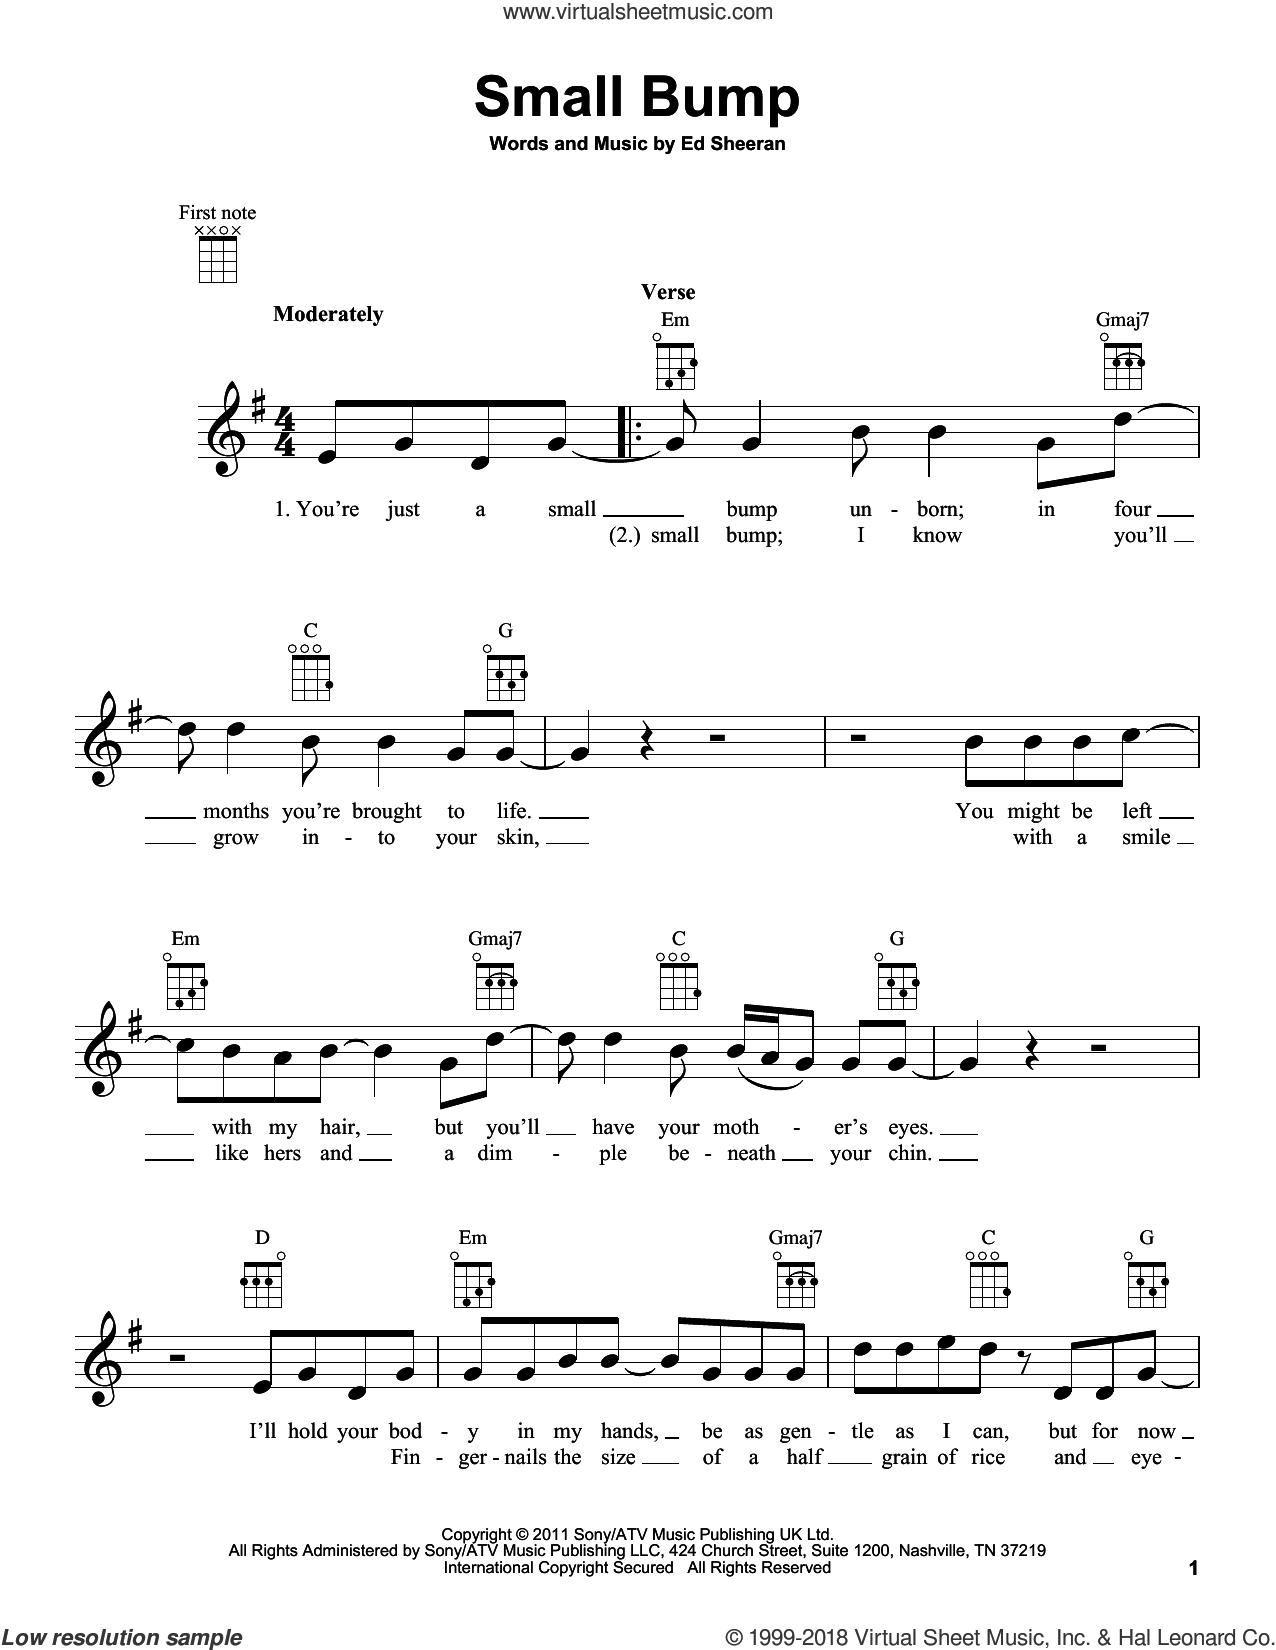 Small Bump sheet music for ukulele by Ed Sheeran, intermediate skill level